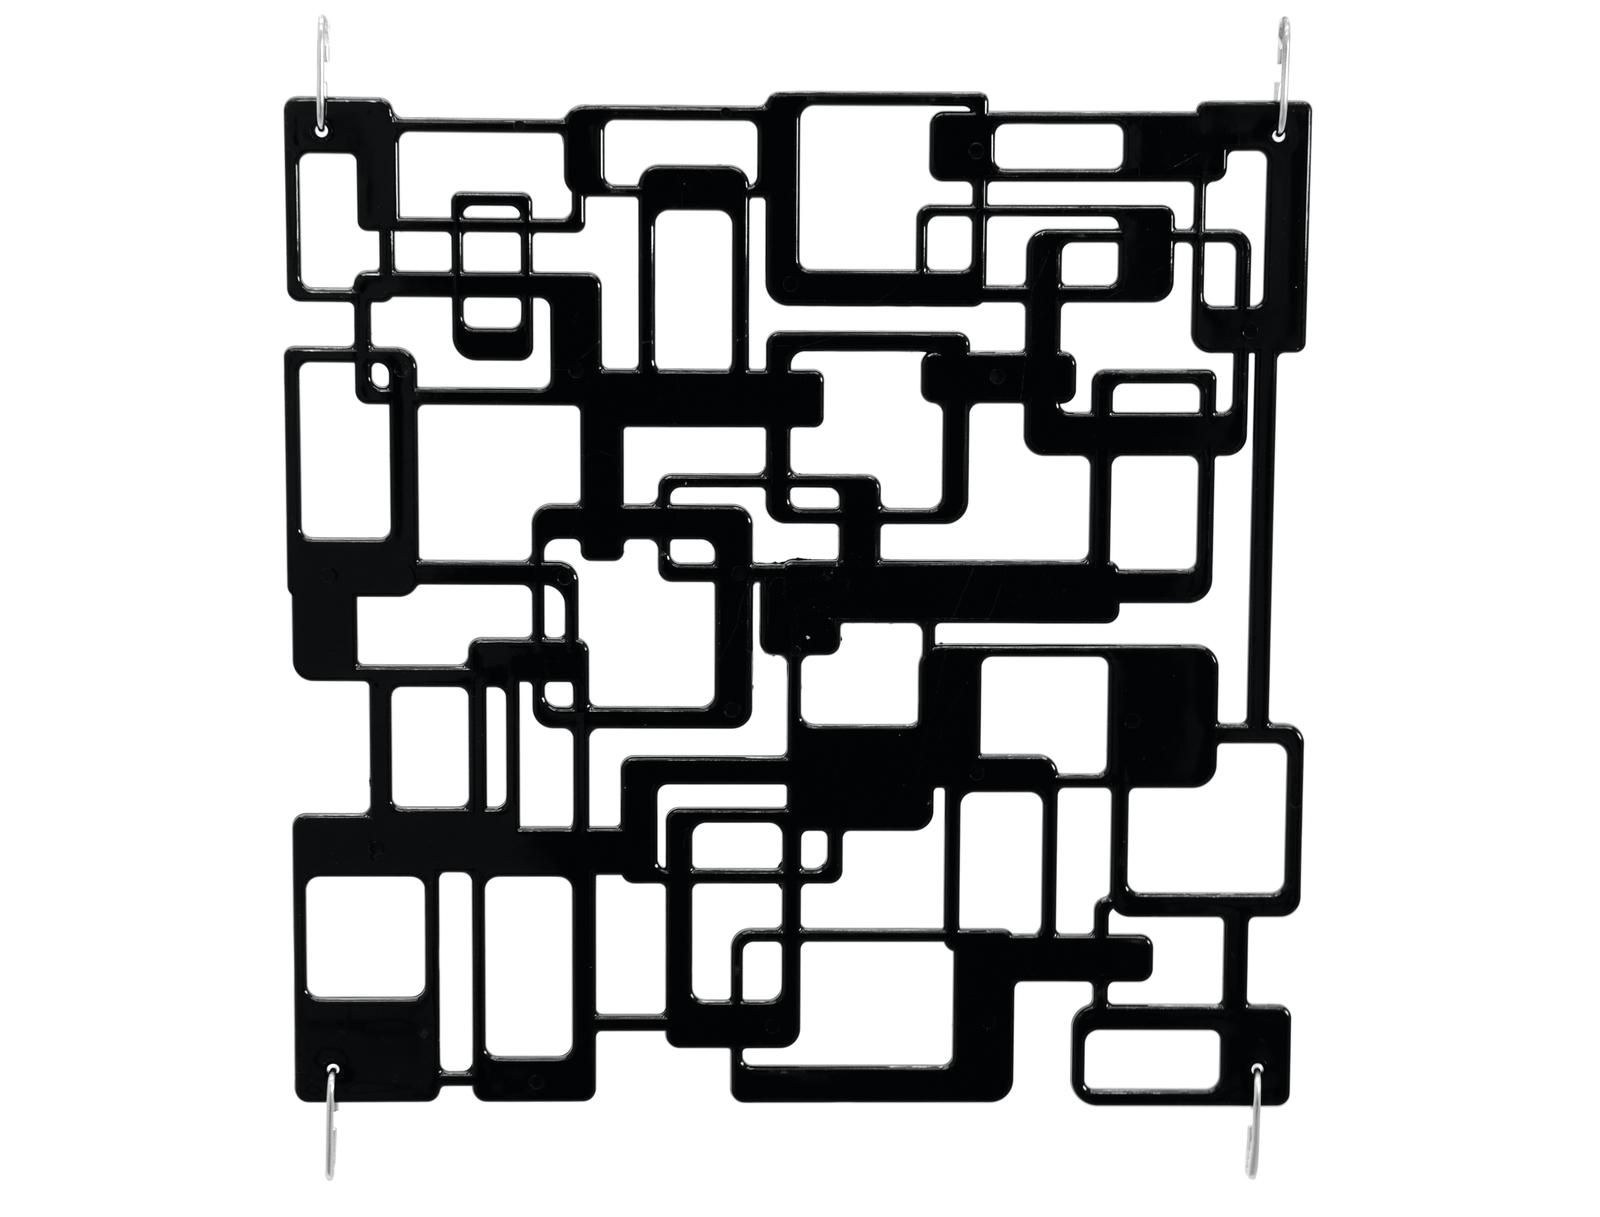 Paraván, vzor labyrint, 36 x 36 cm, sada 4ks, černá